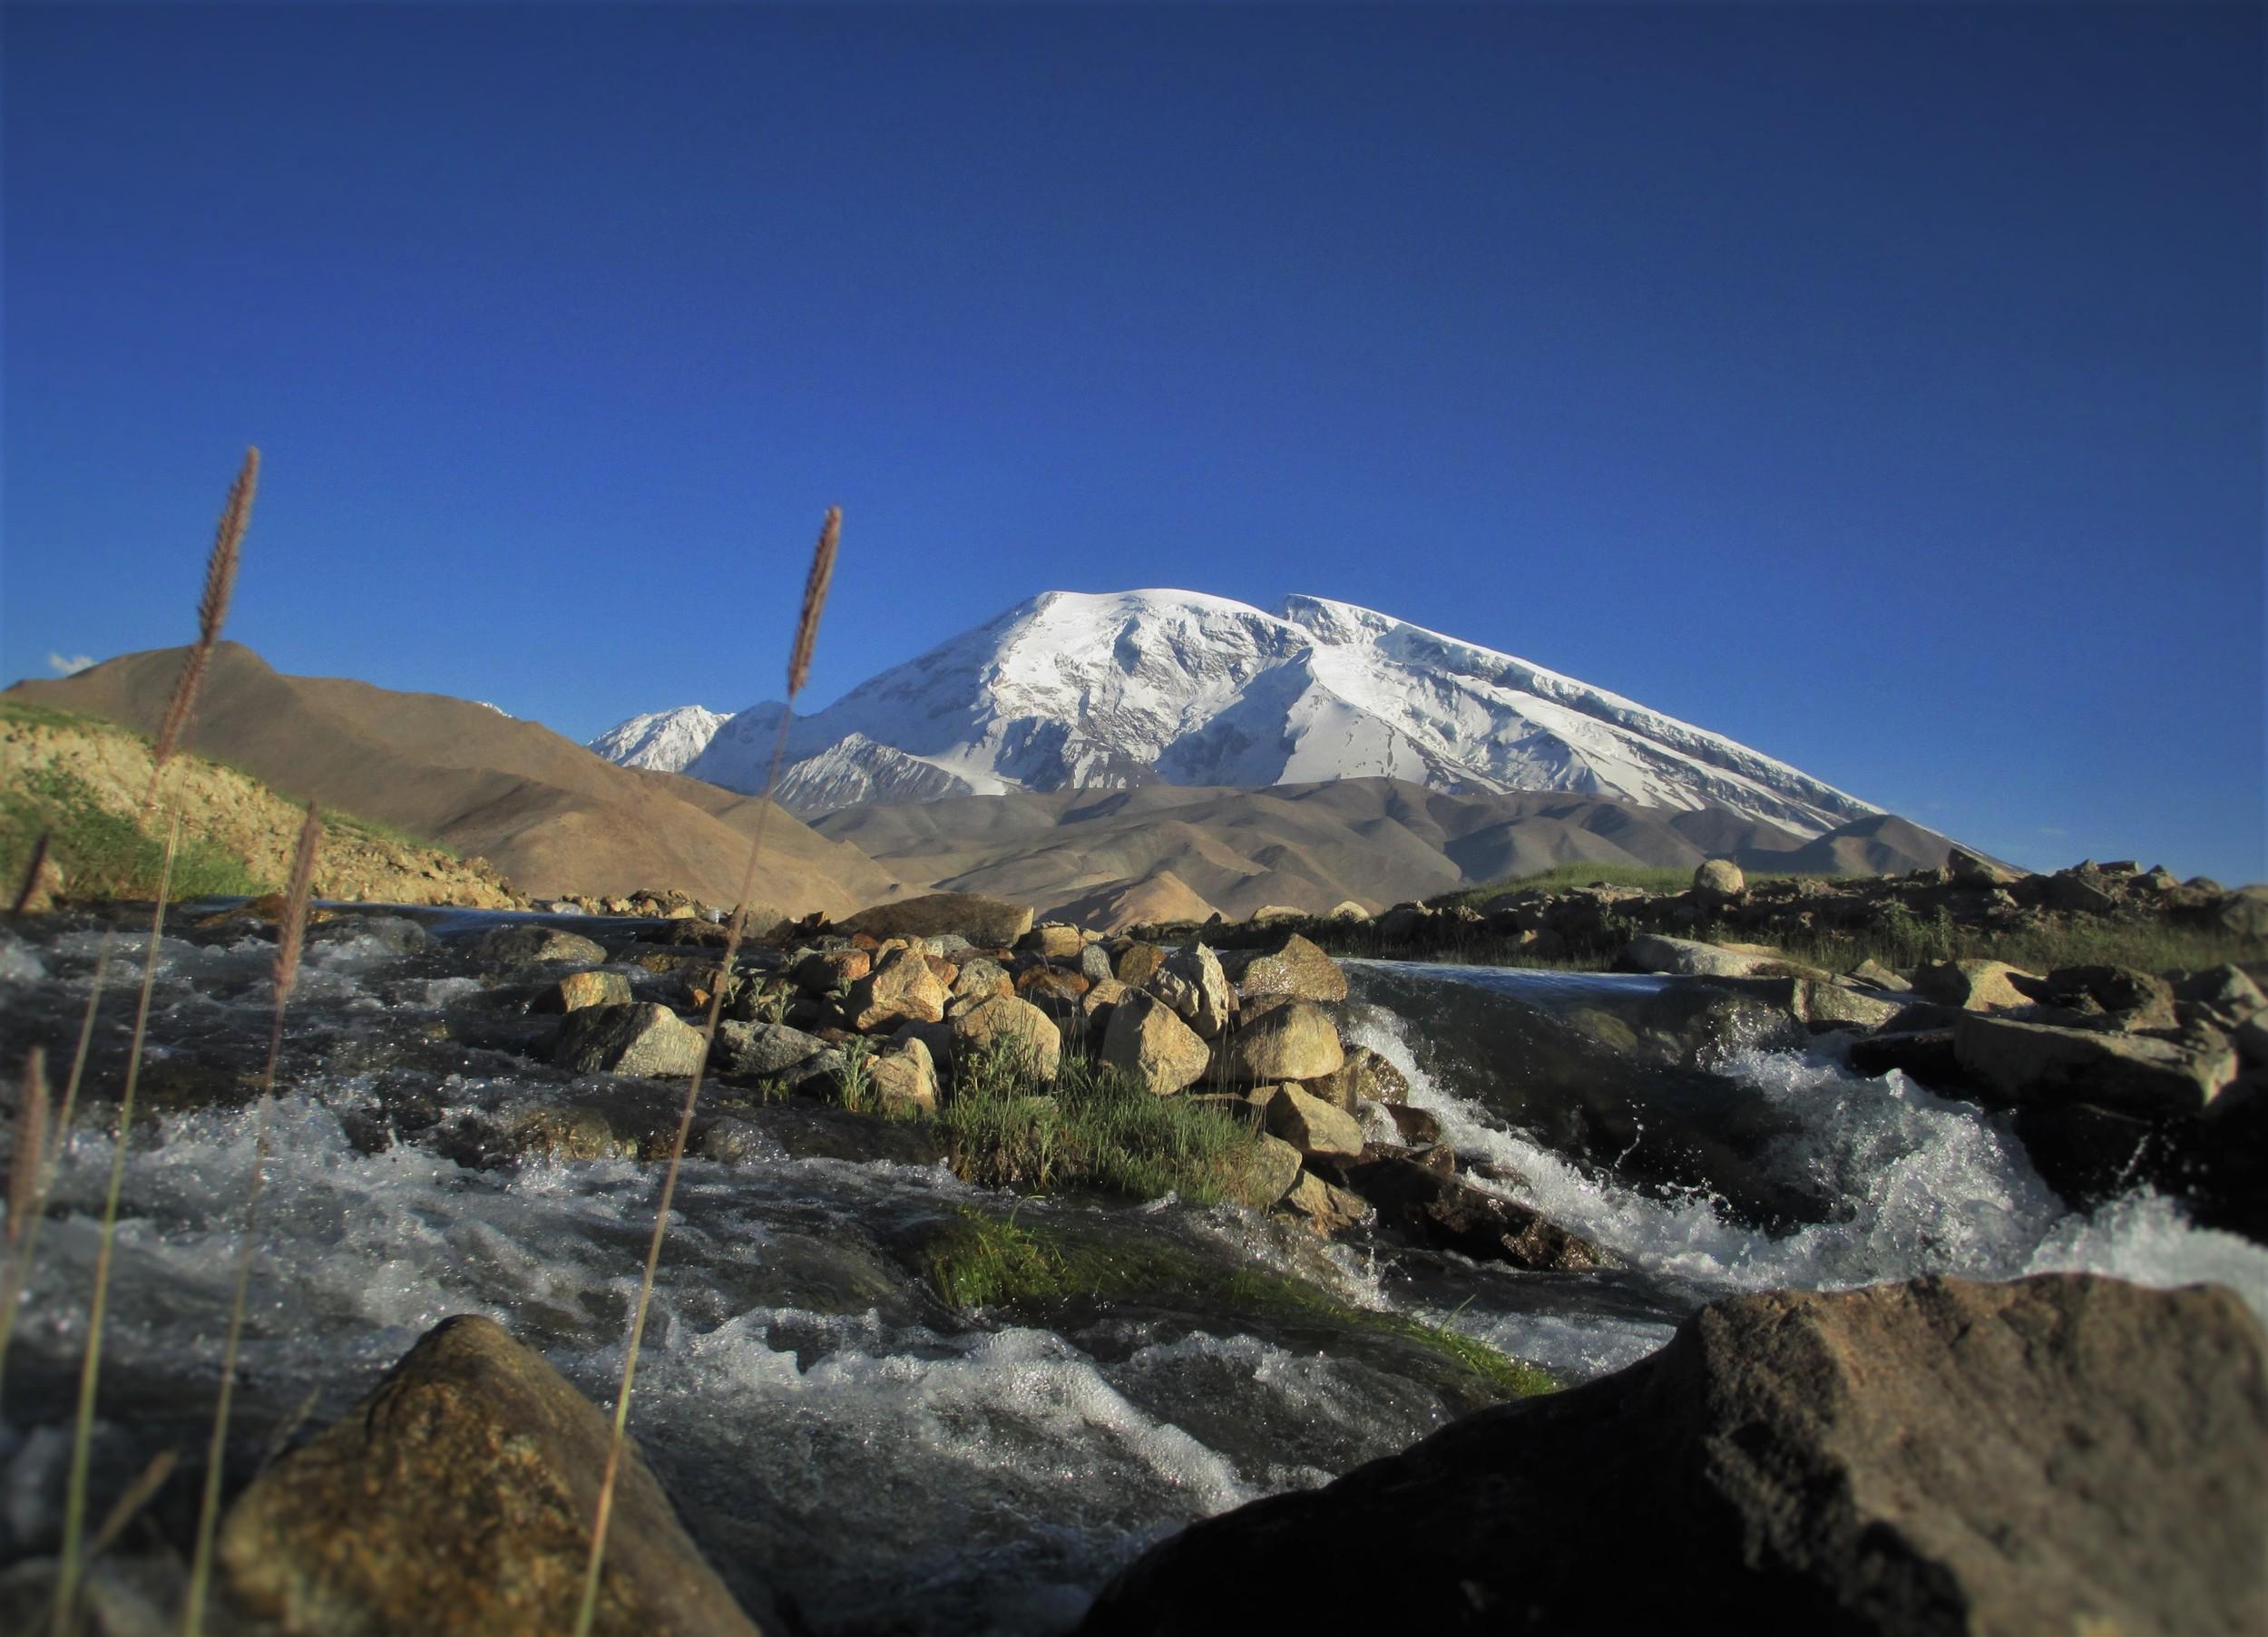 Mustaga Ata 7509 m from Krakol lake on the Karakorum Highway